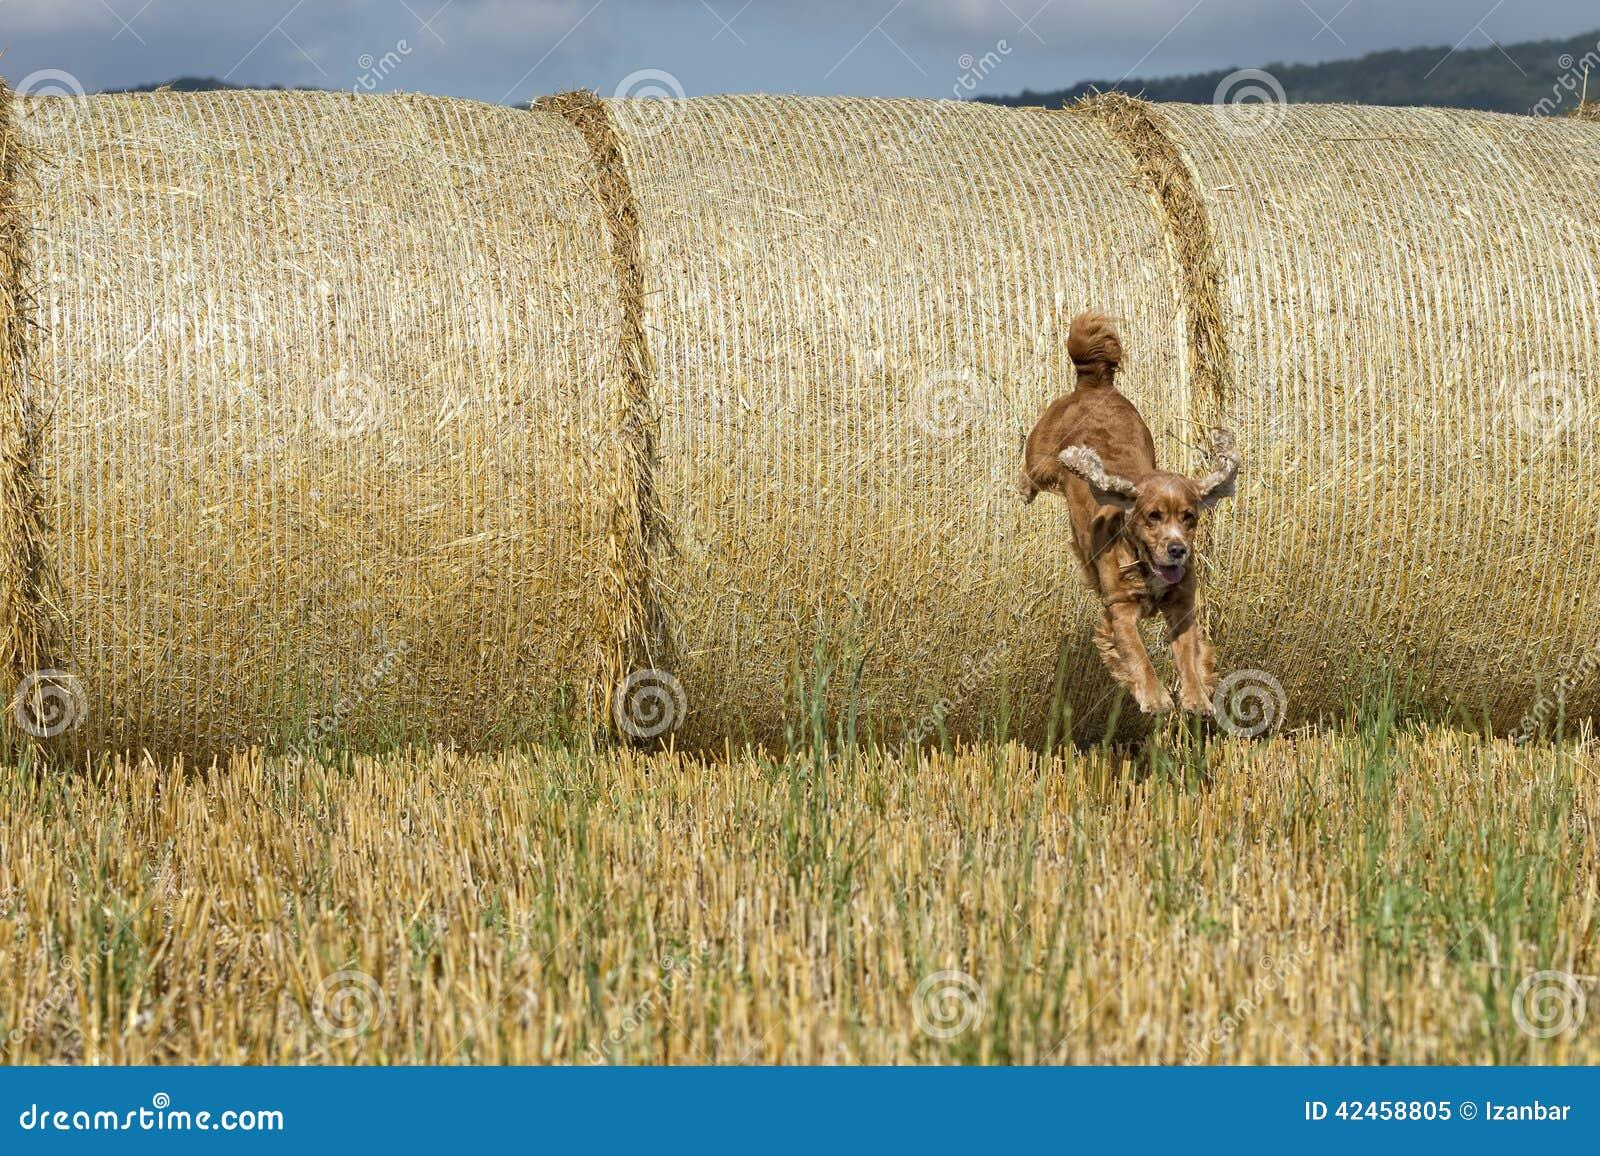 Hundewelpe cocker spaniel, das vom Weizenball springt